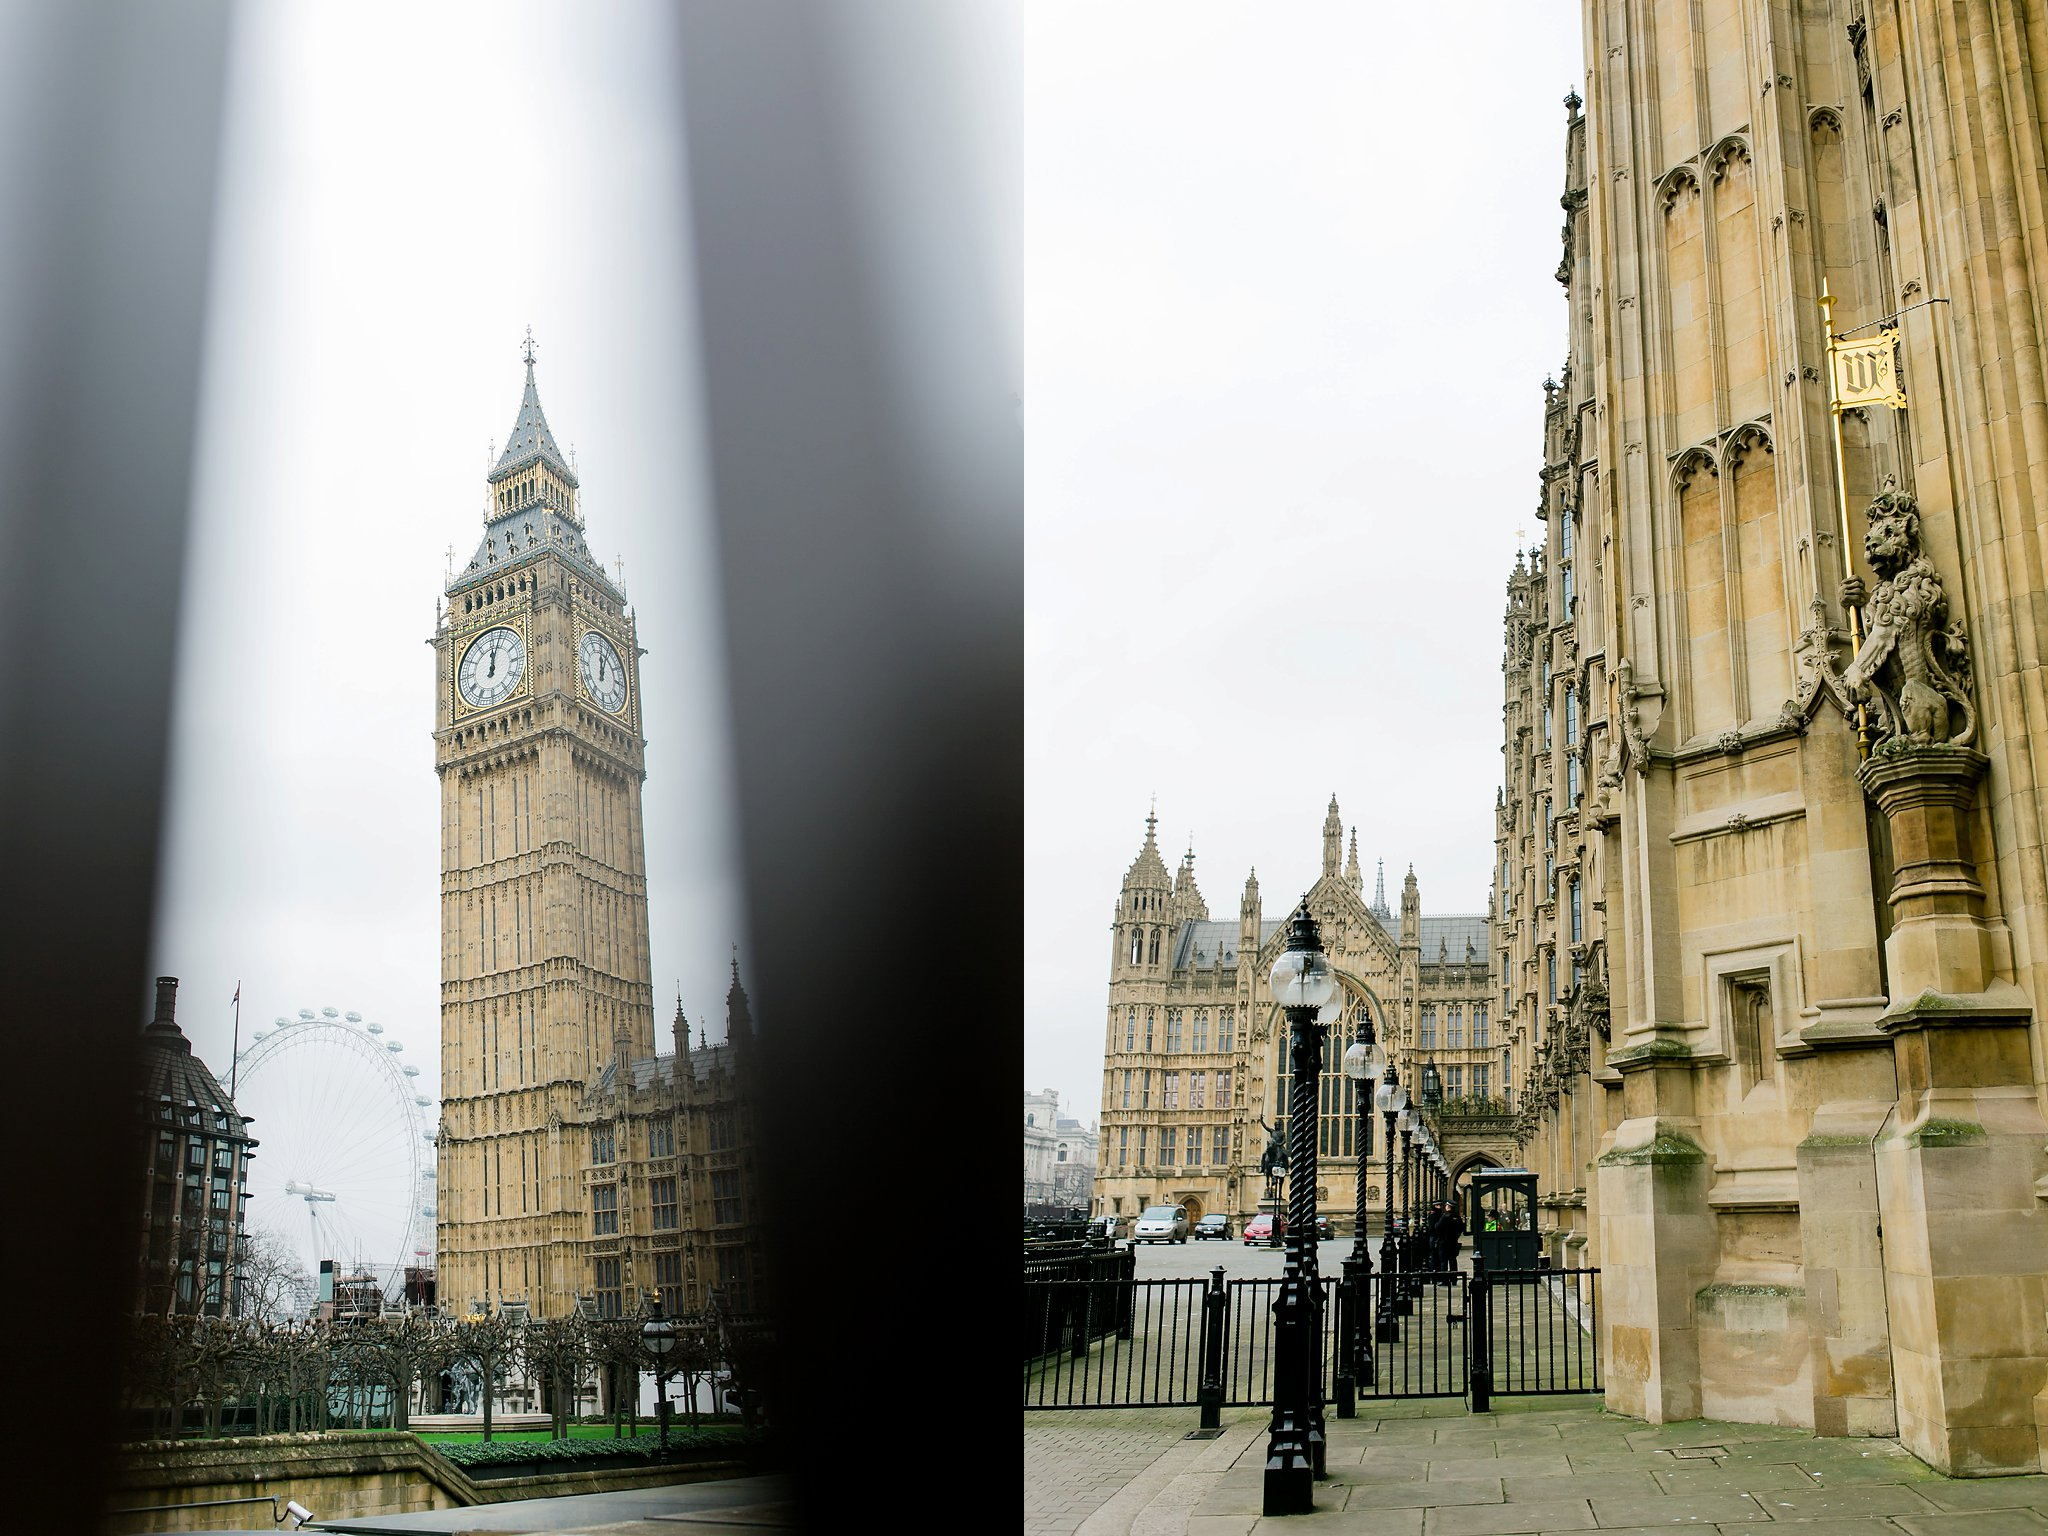 London Part II Westminster Abbey Tower Bridge Tower of London Big Ben-1850.jpg